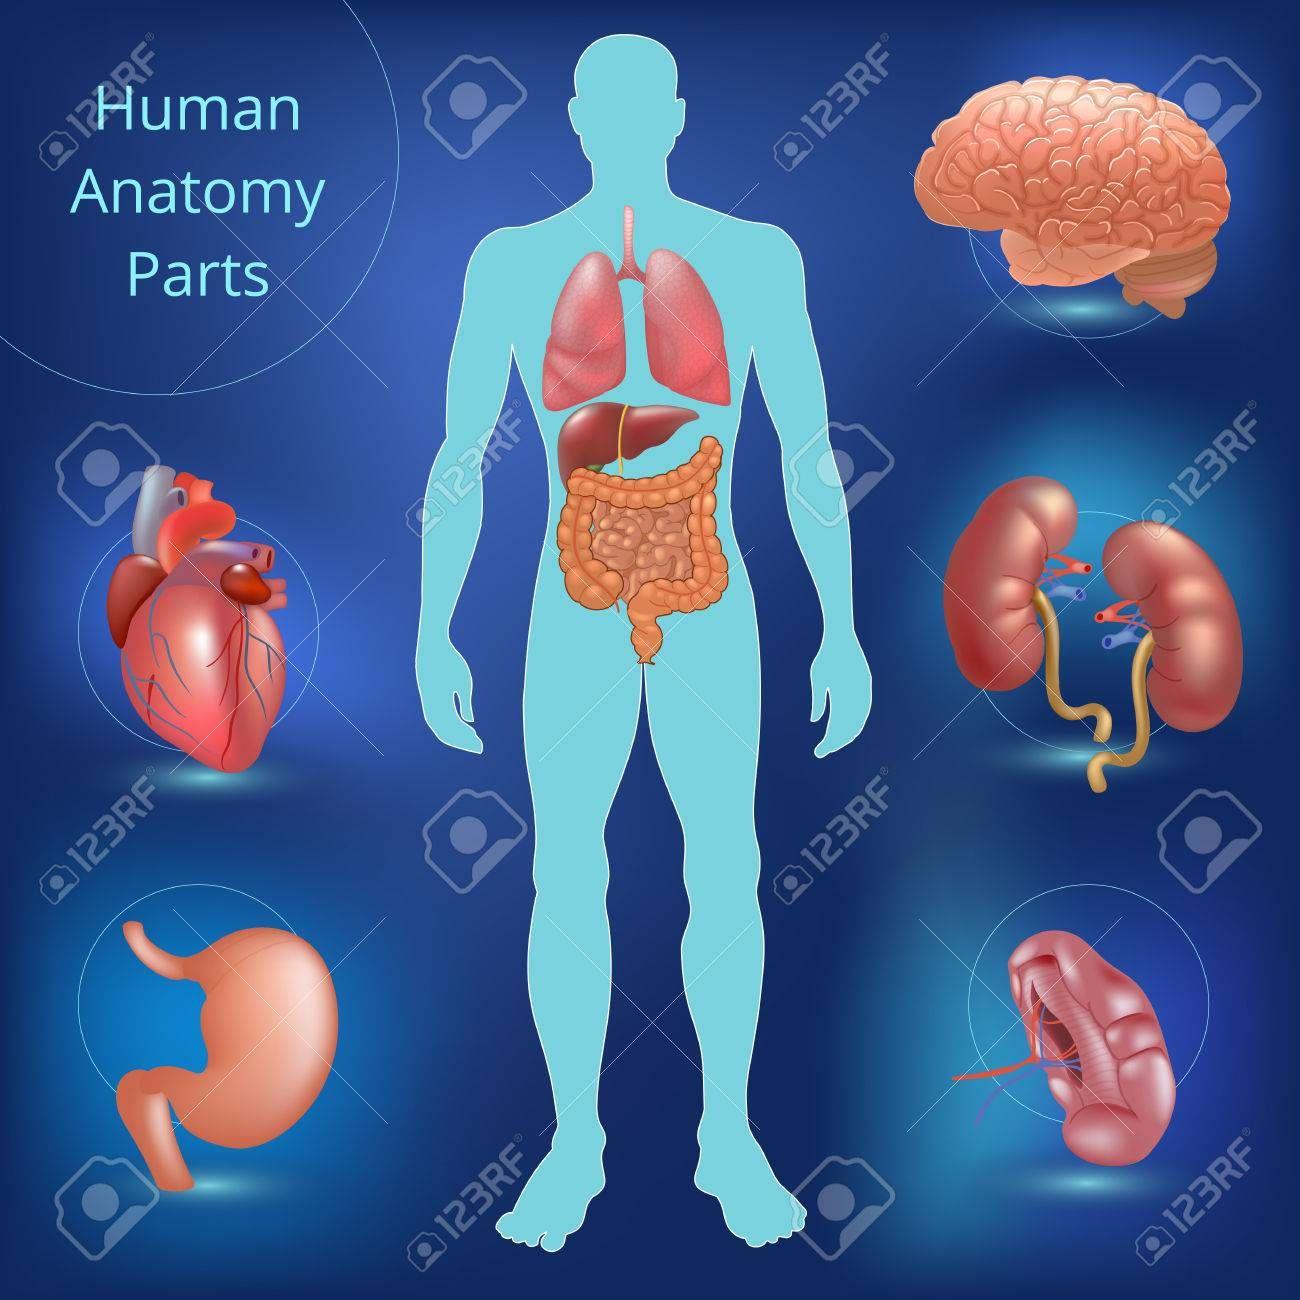 Human Anatomy Of Liver Human Body Anatomy Human Body Human Body